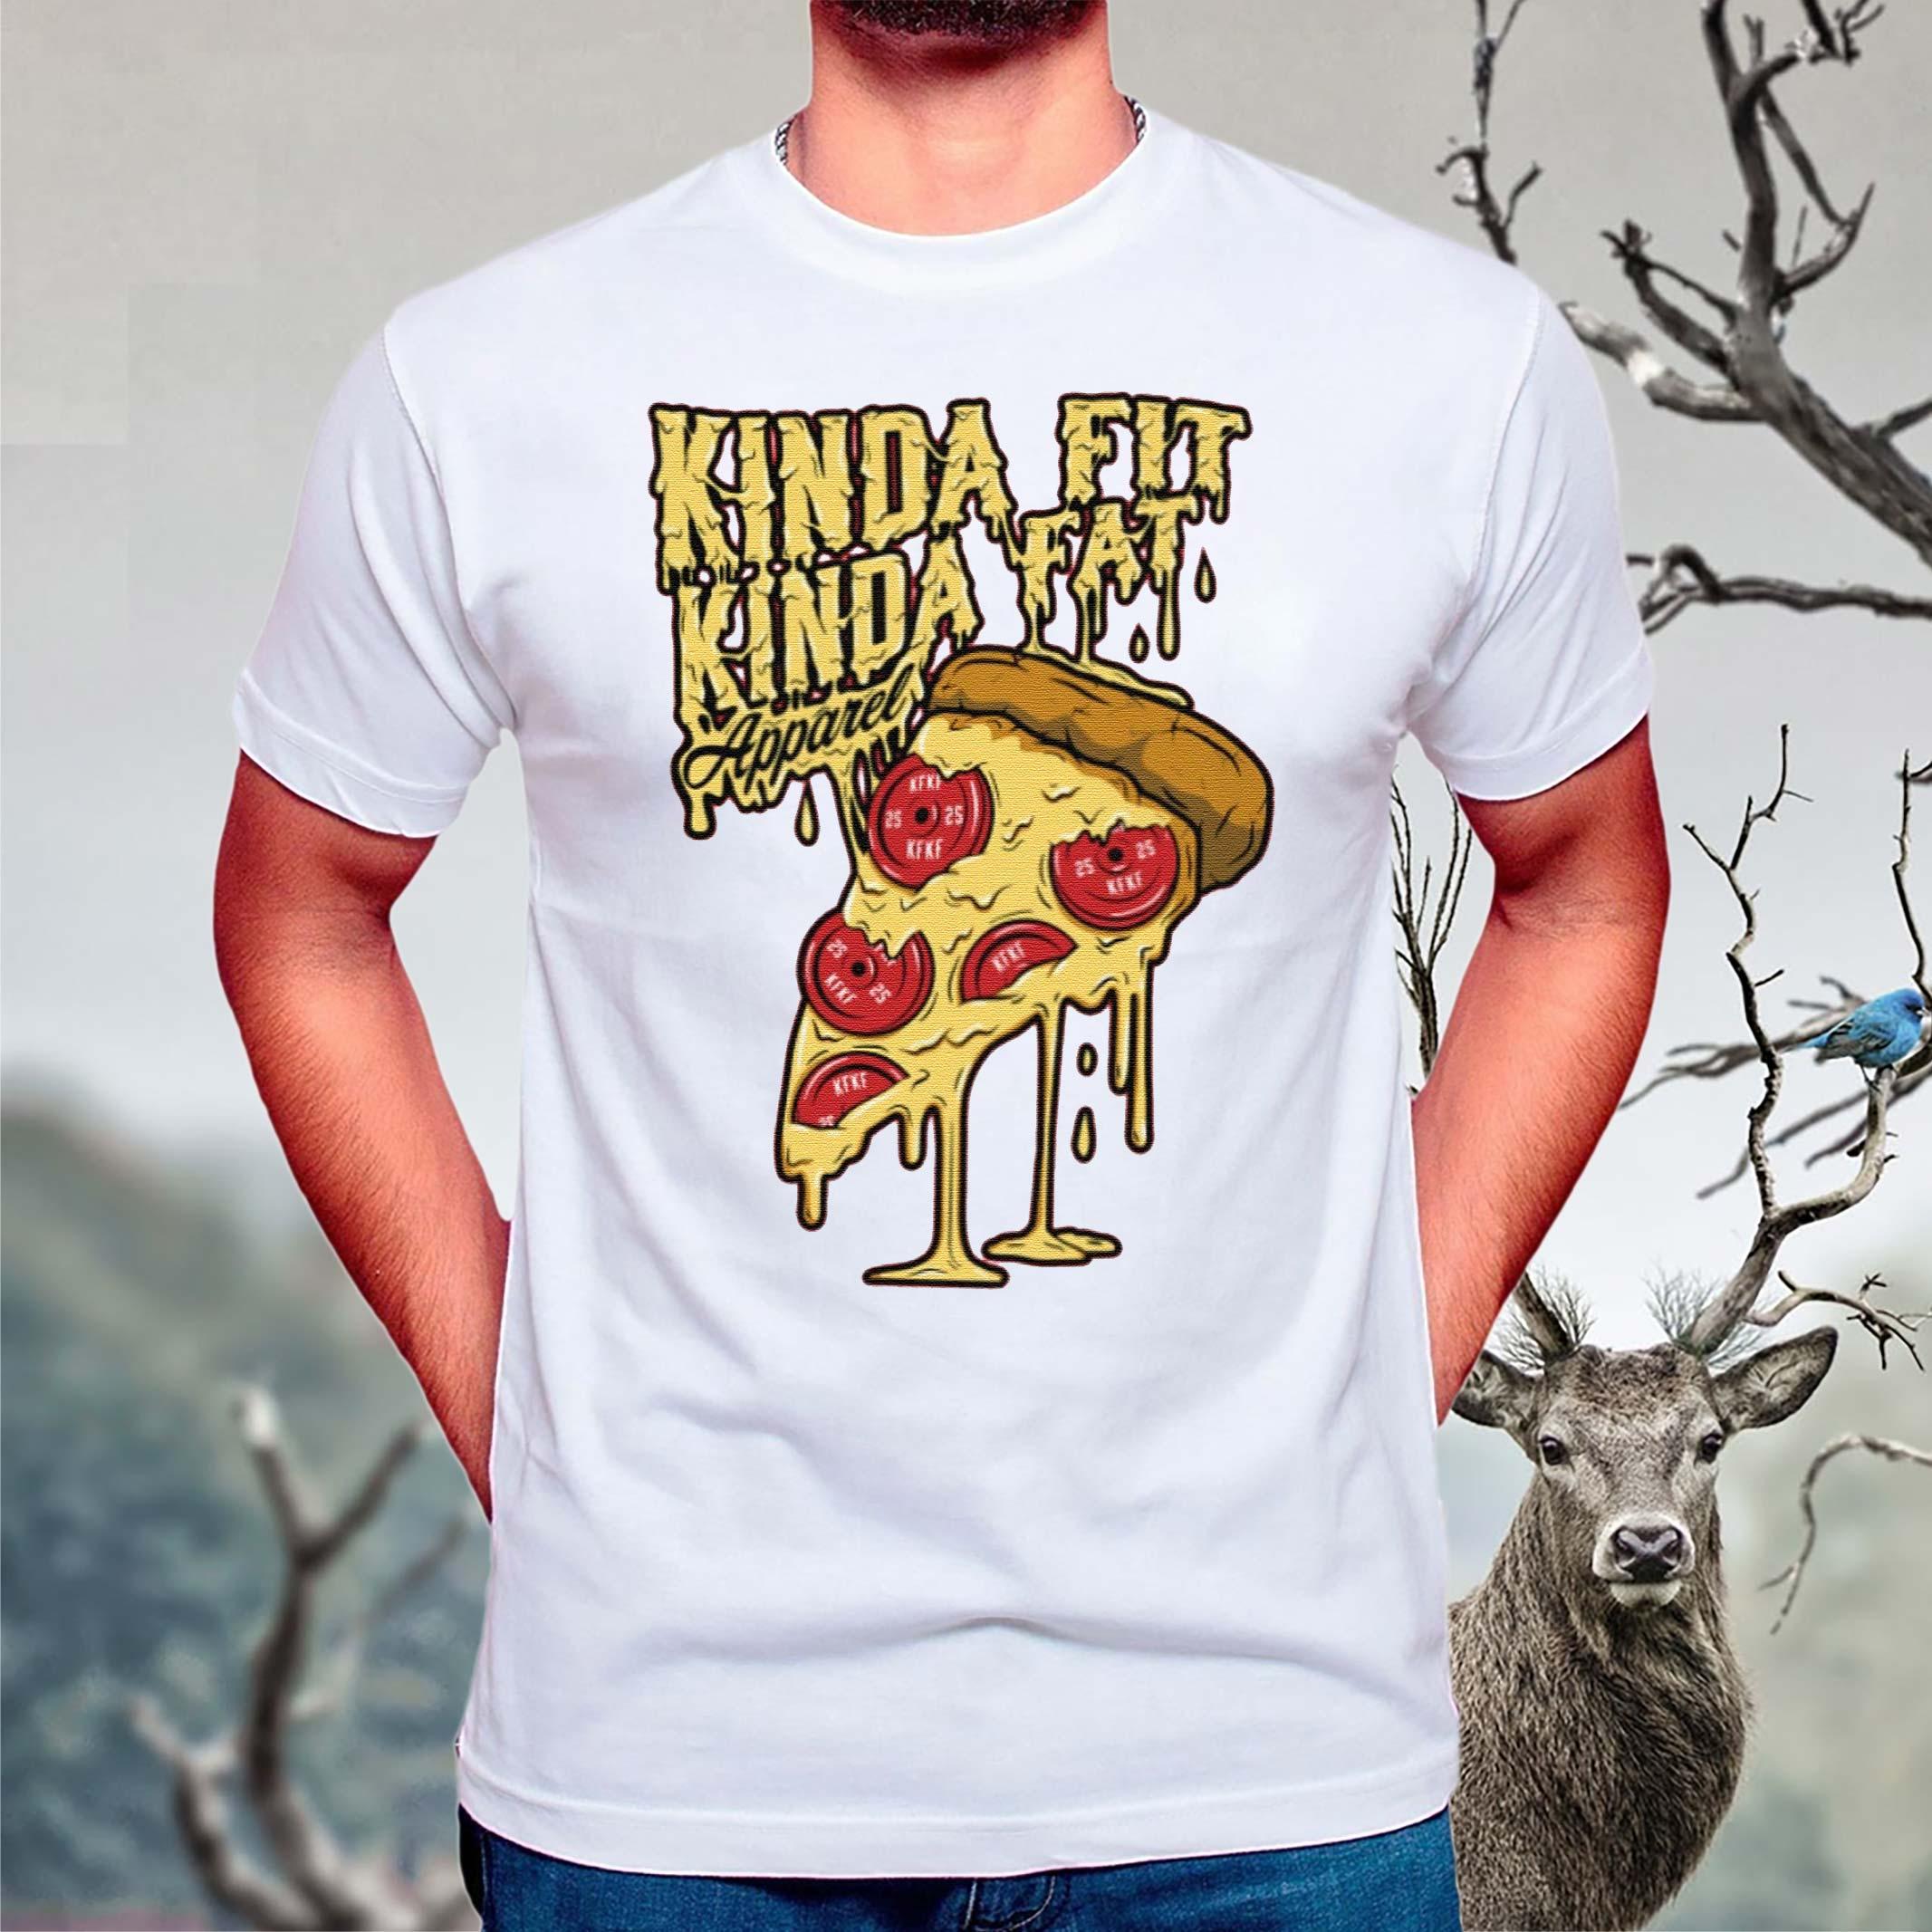 Kinda-Fit-Kinda-Fat-Shirt